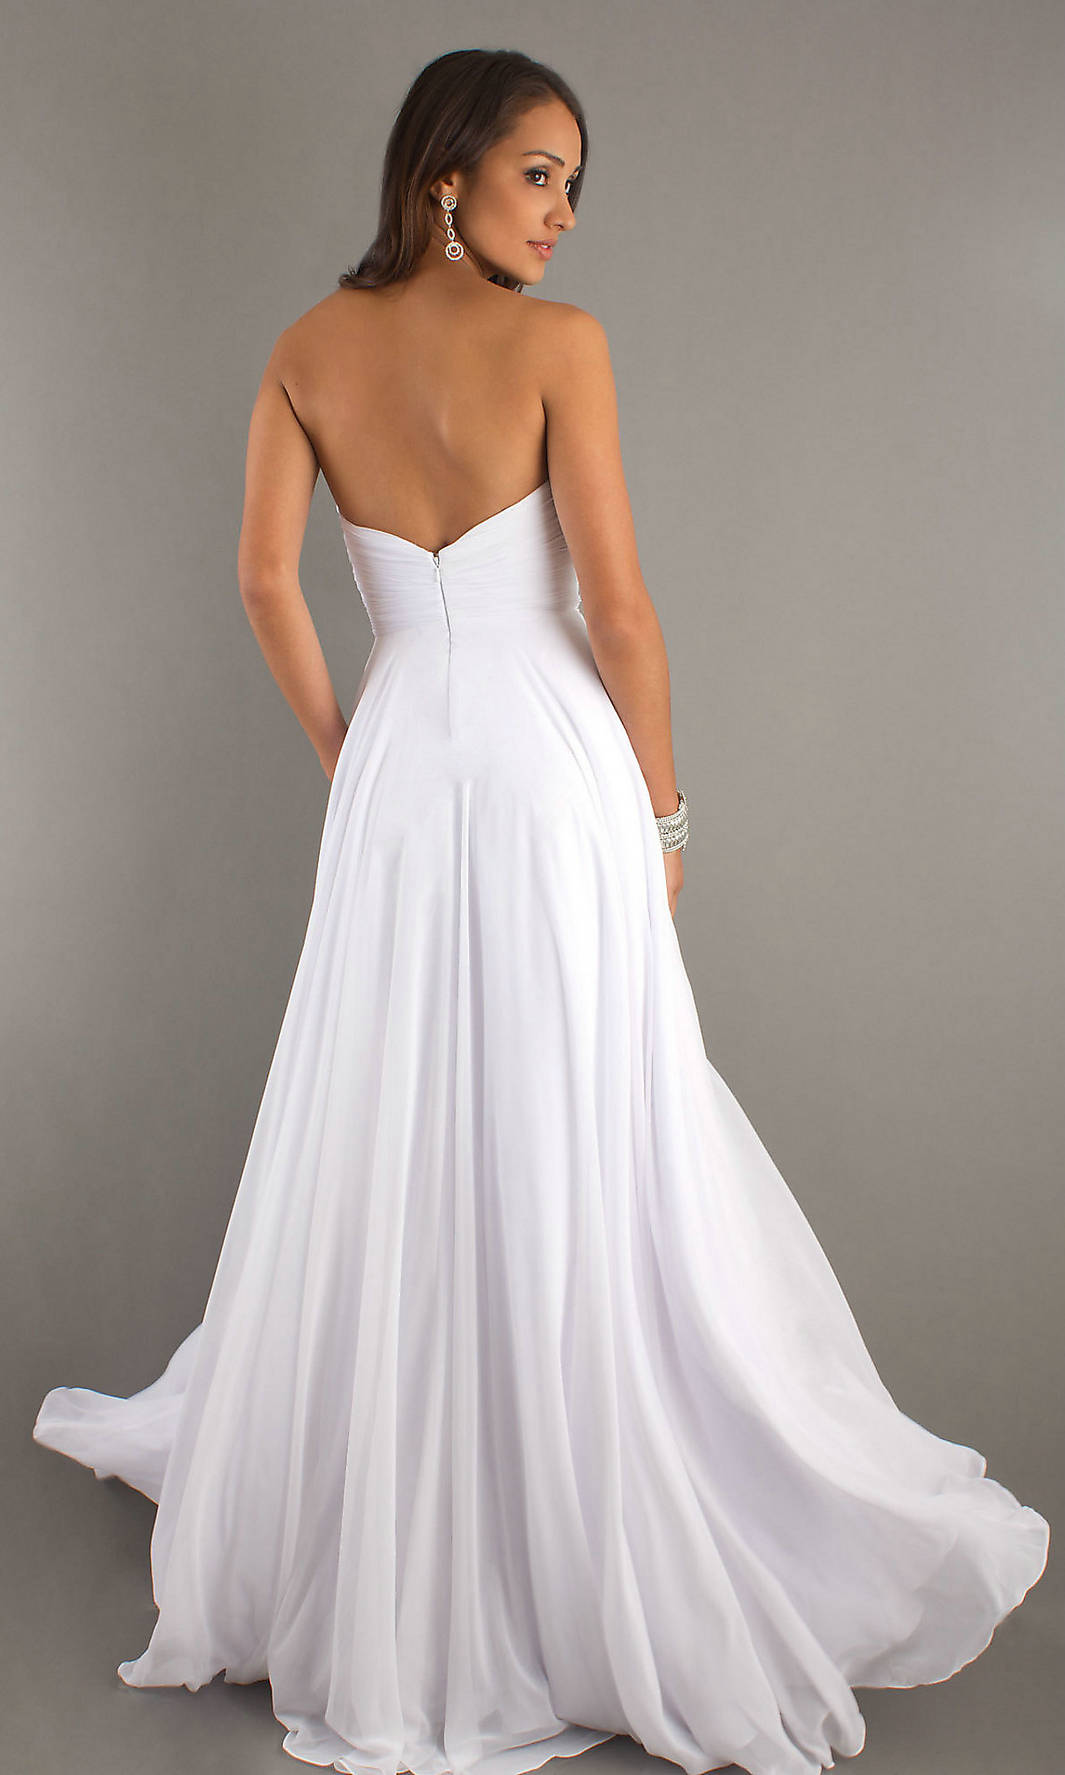 Cute White Prom Dresses